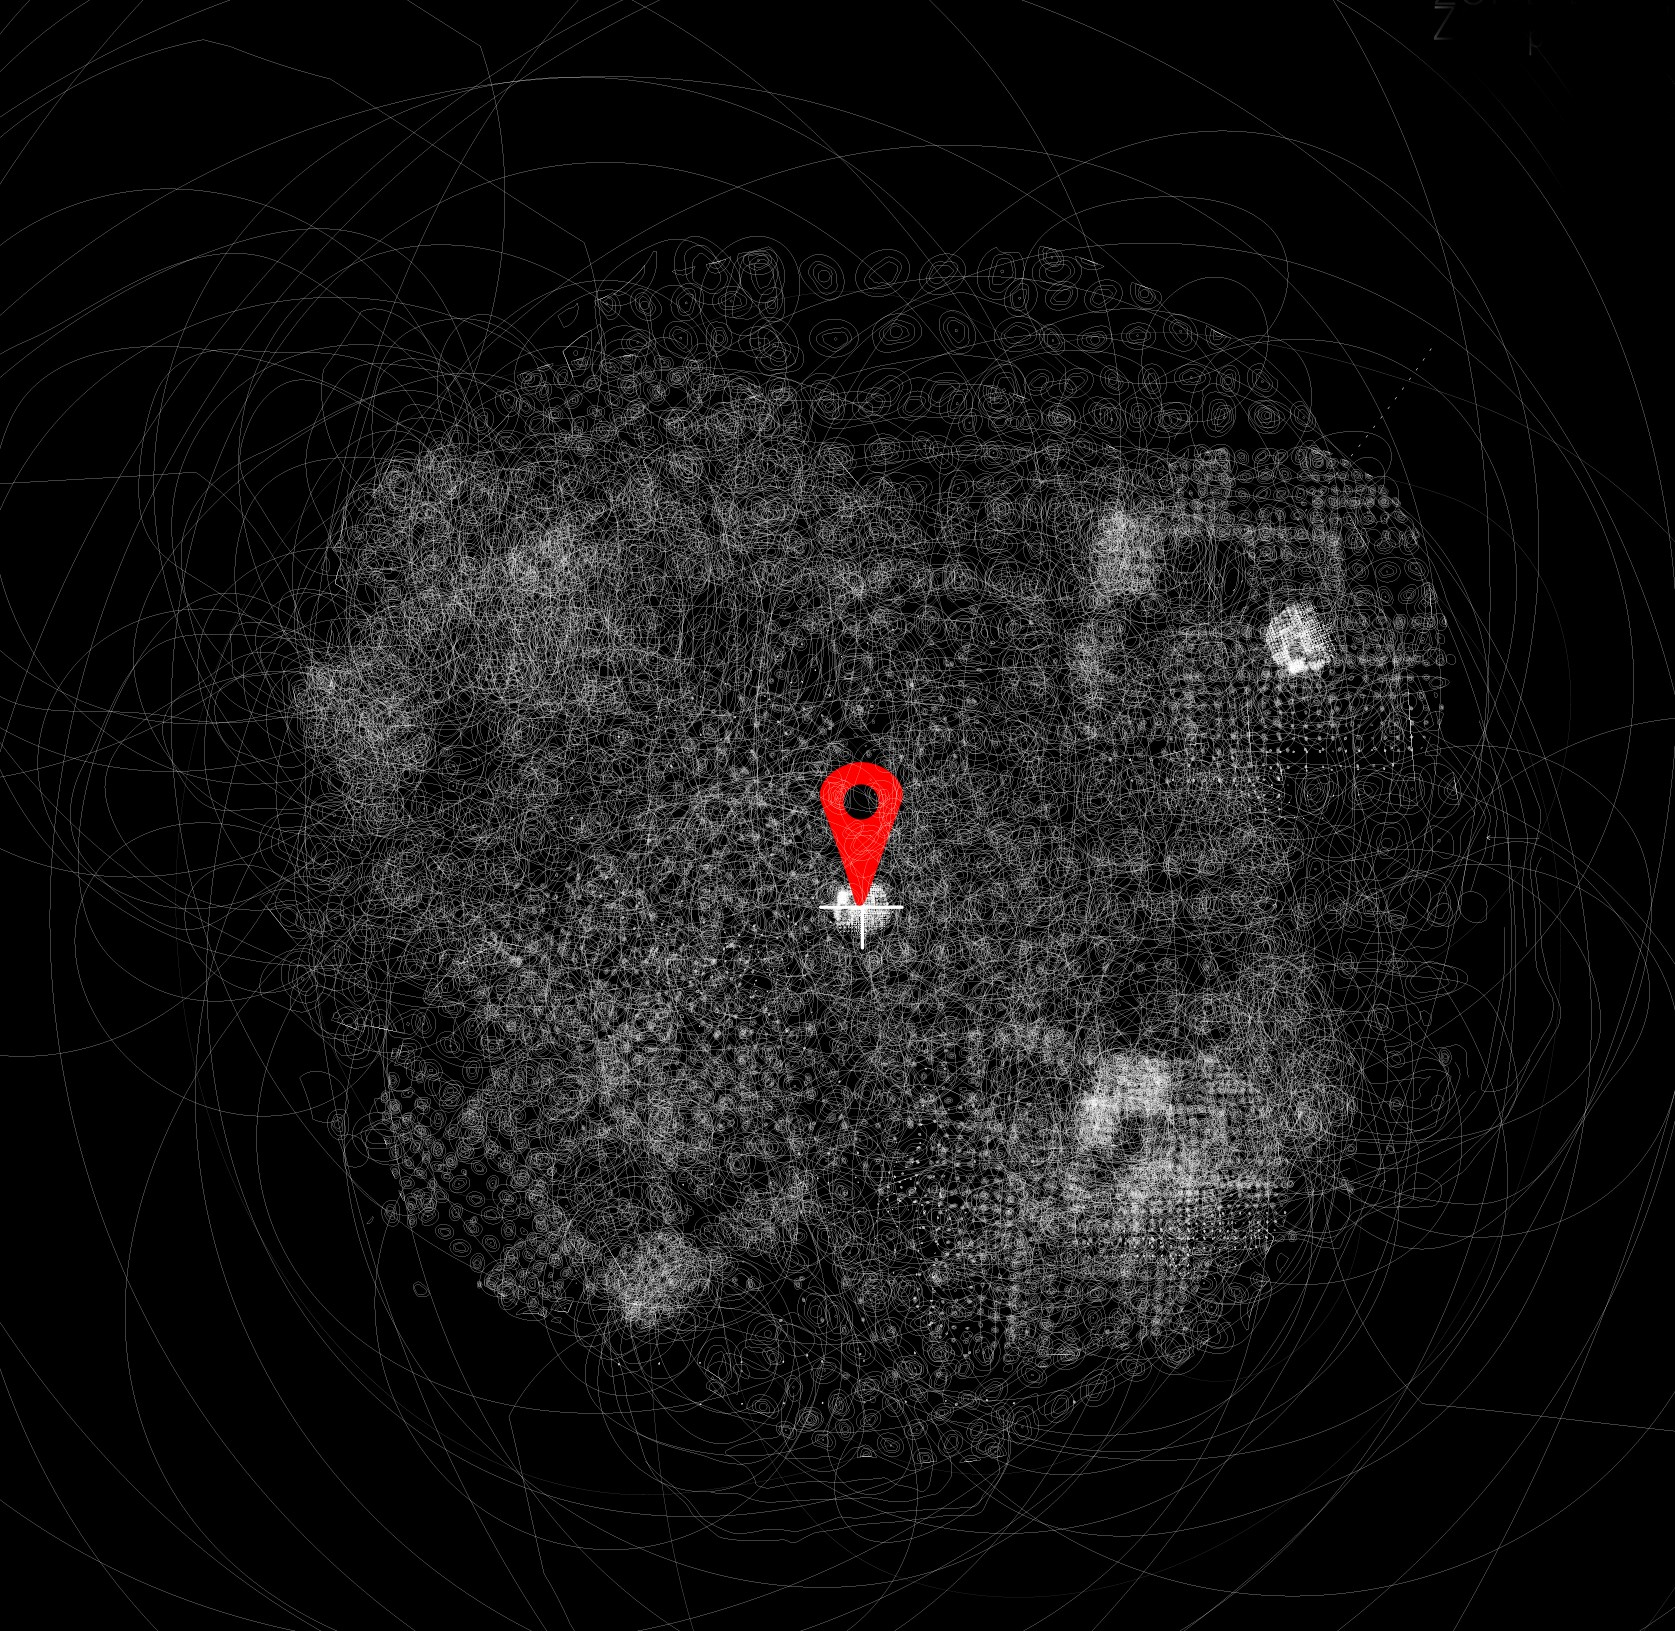 Moving Earths - Nanterre-Amandiers